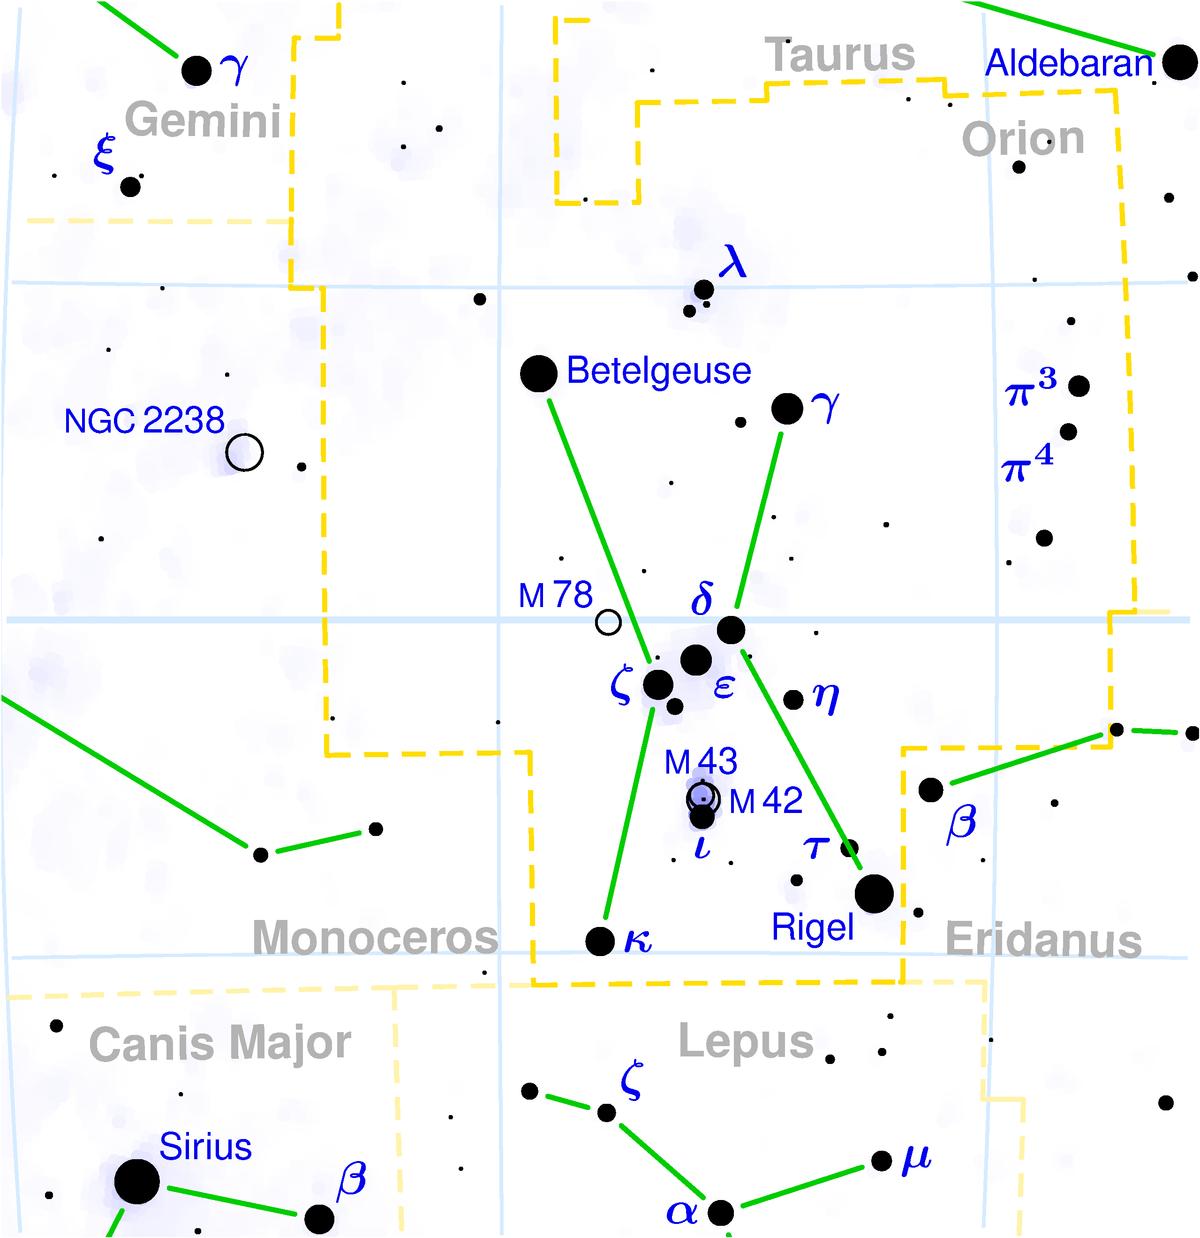 orion (stjernebilde) – wikipedia alnitak hr diagram hr diagram test question